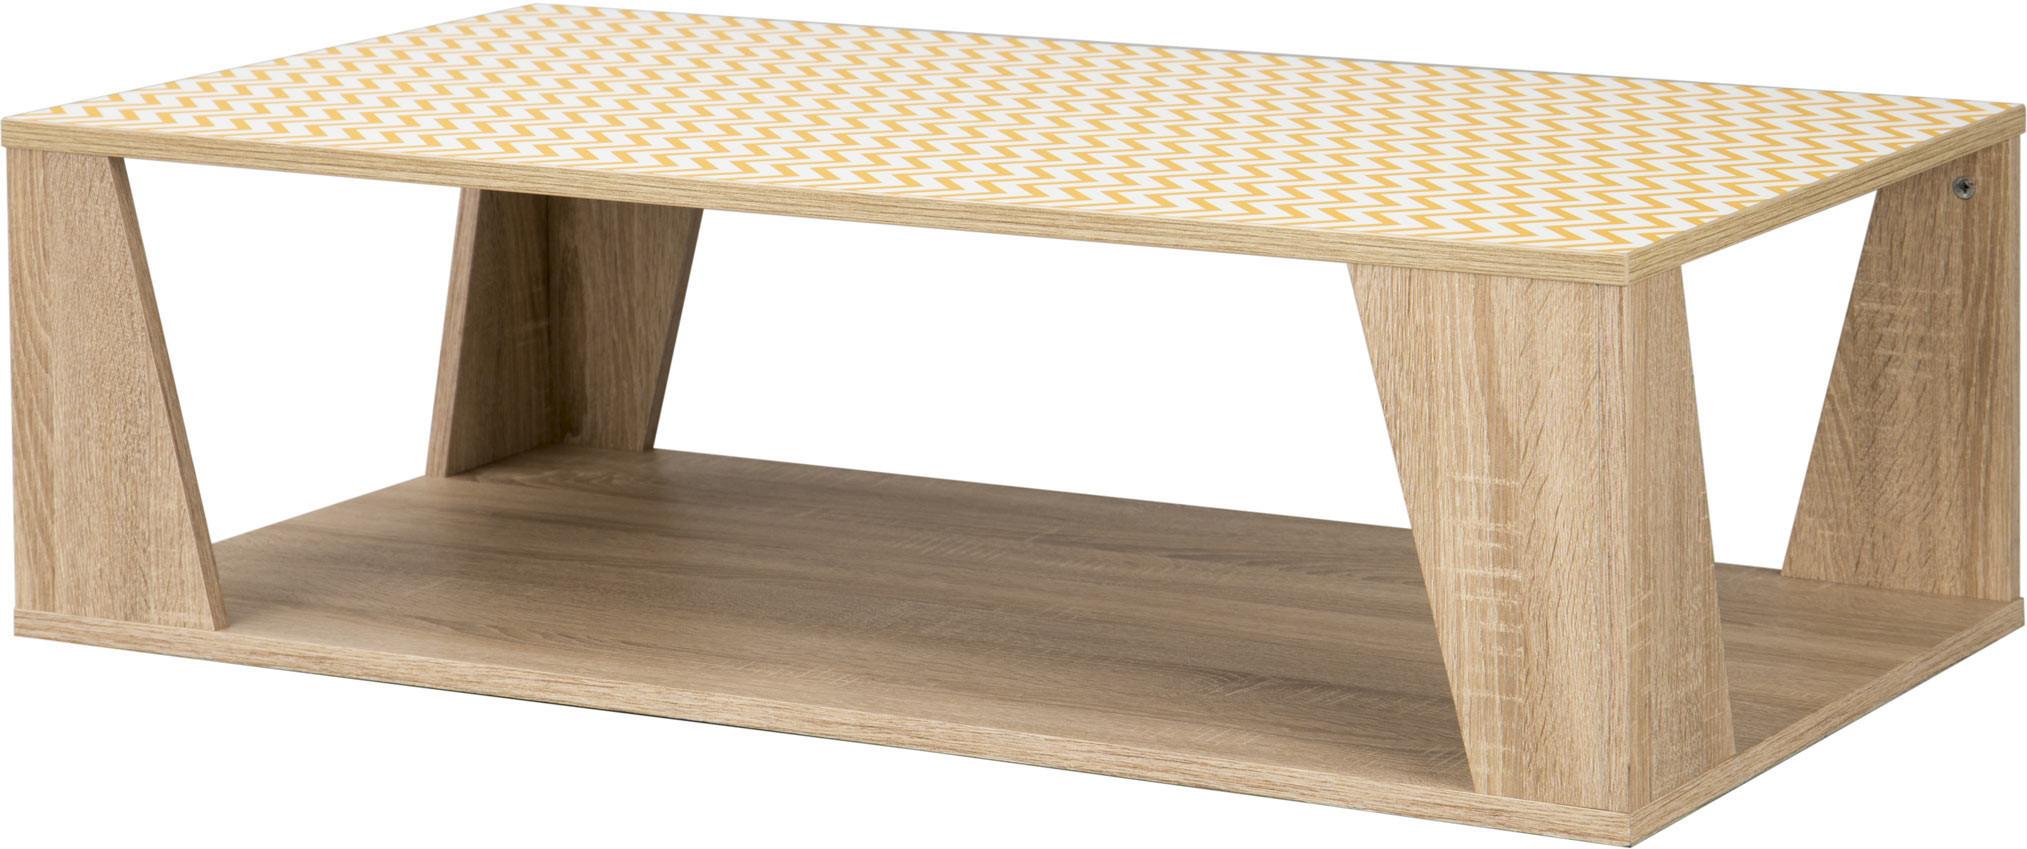 Table basse scandinave chêne clair/sérigraphies jaunes Martina